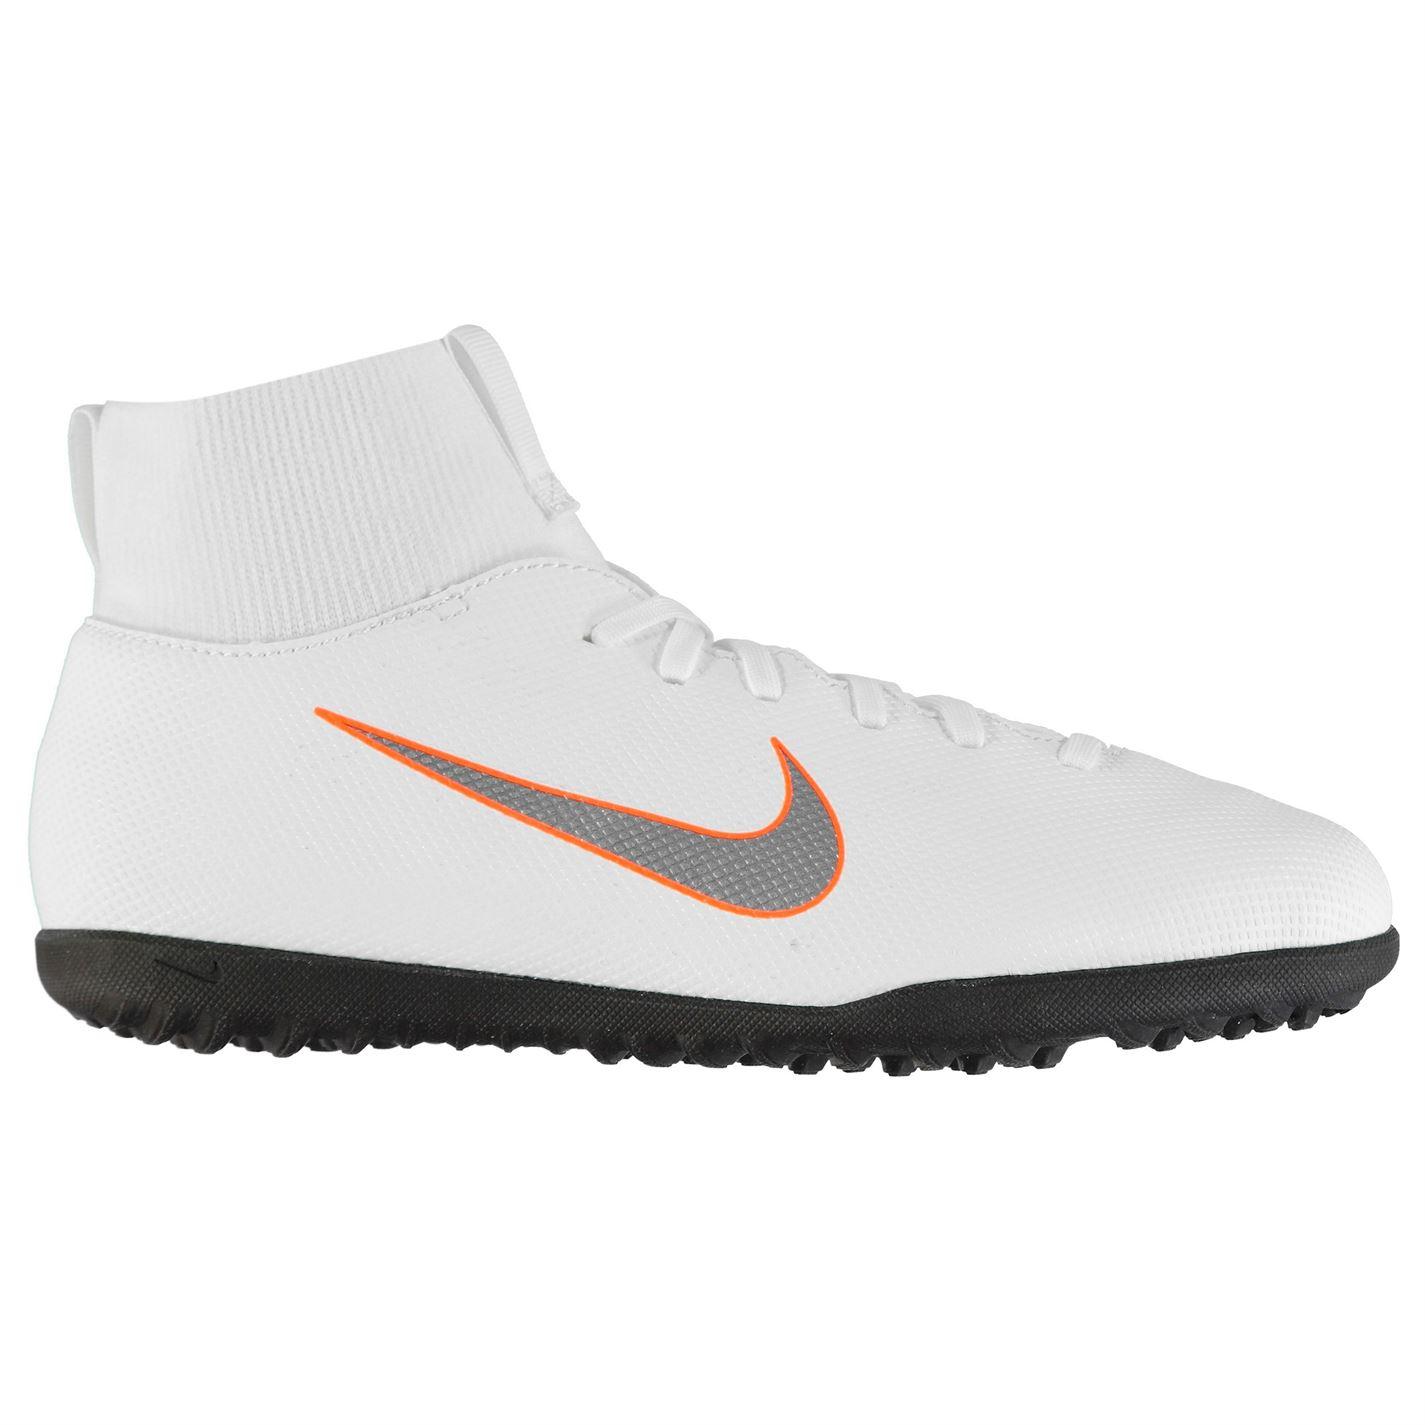 boty Nike Mercurial Superfly Club DF detské Astro Turf